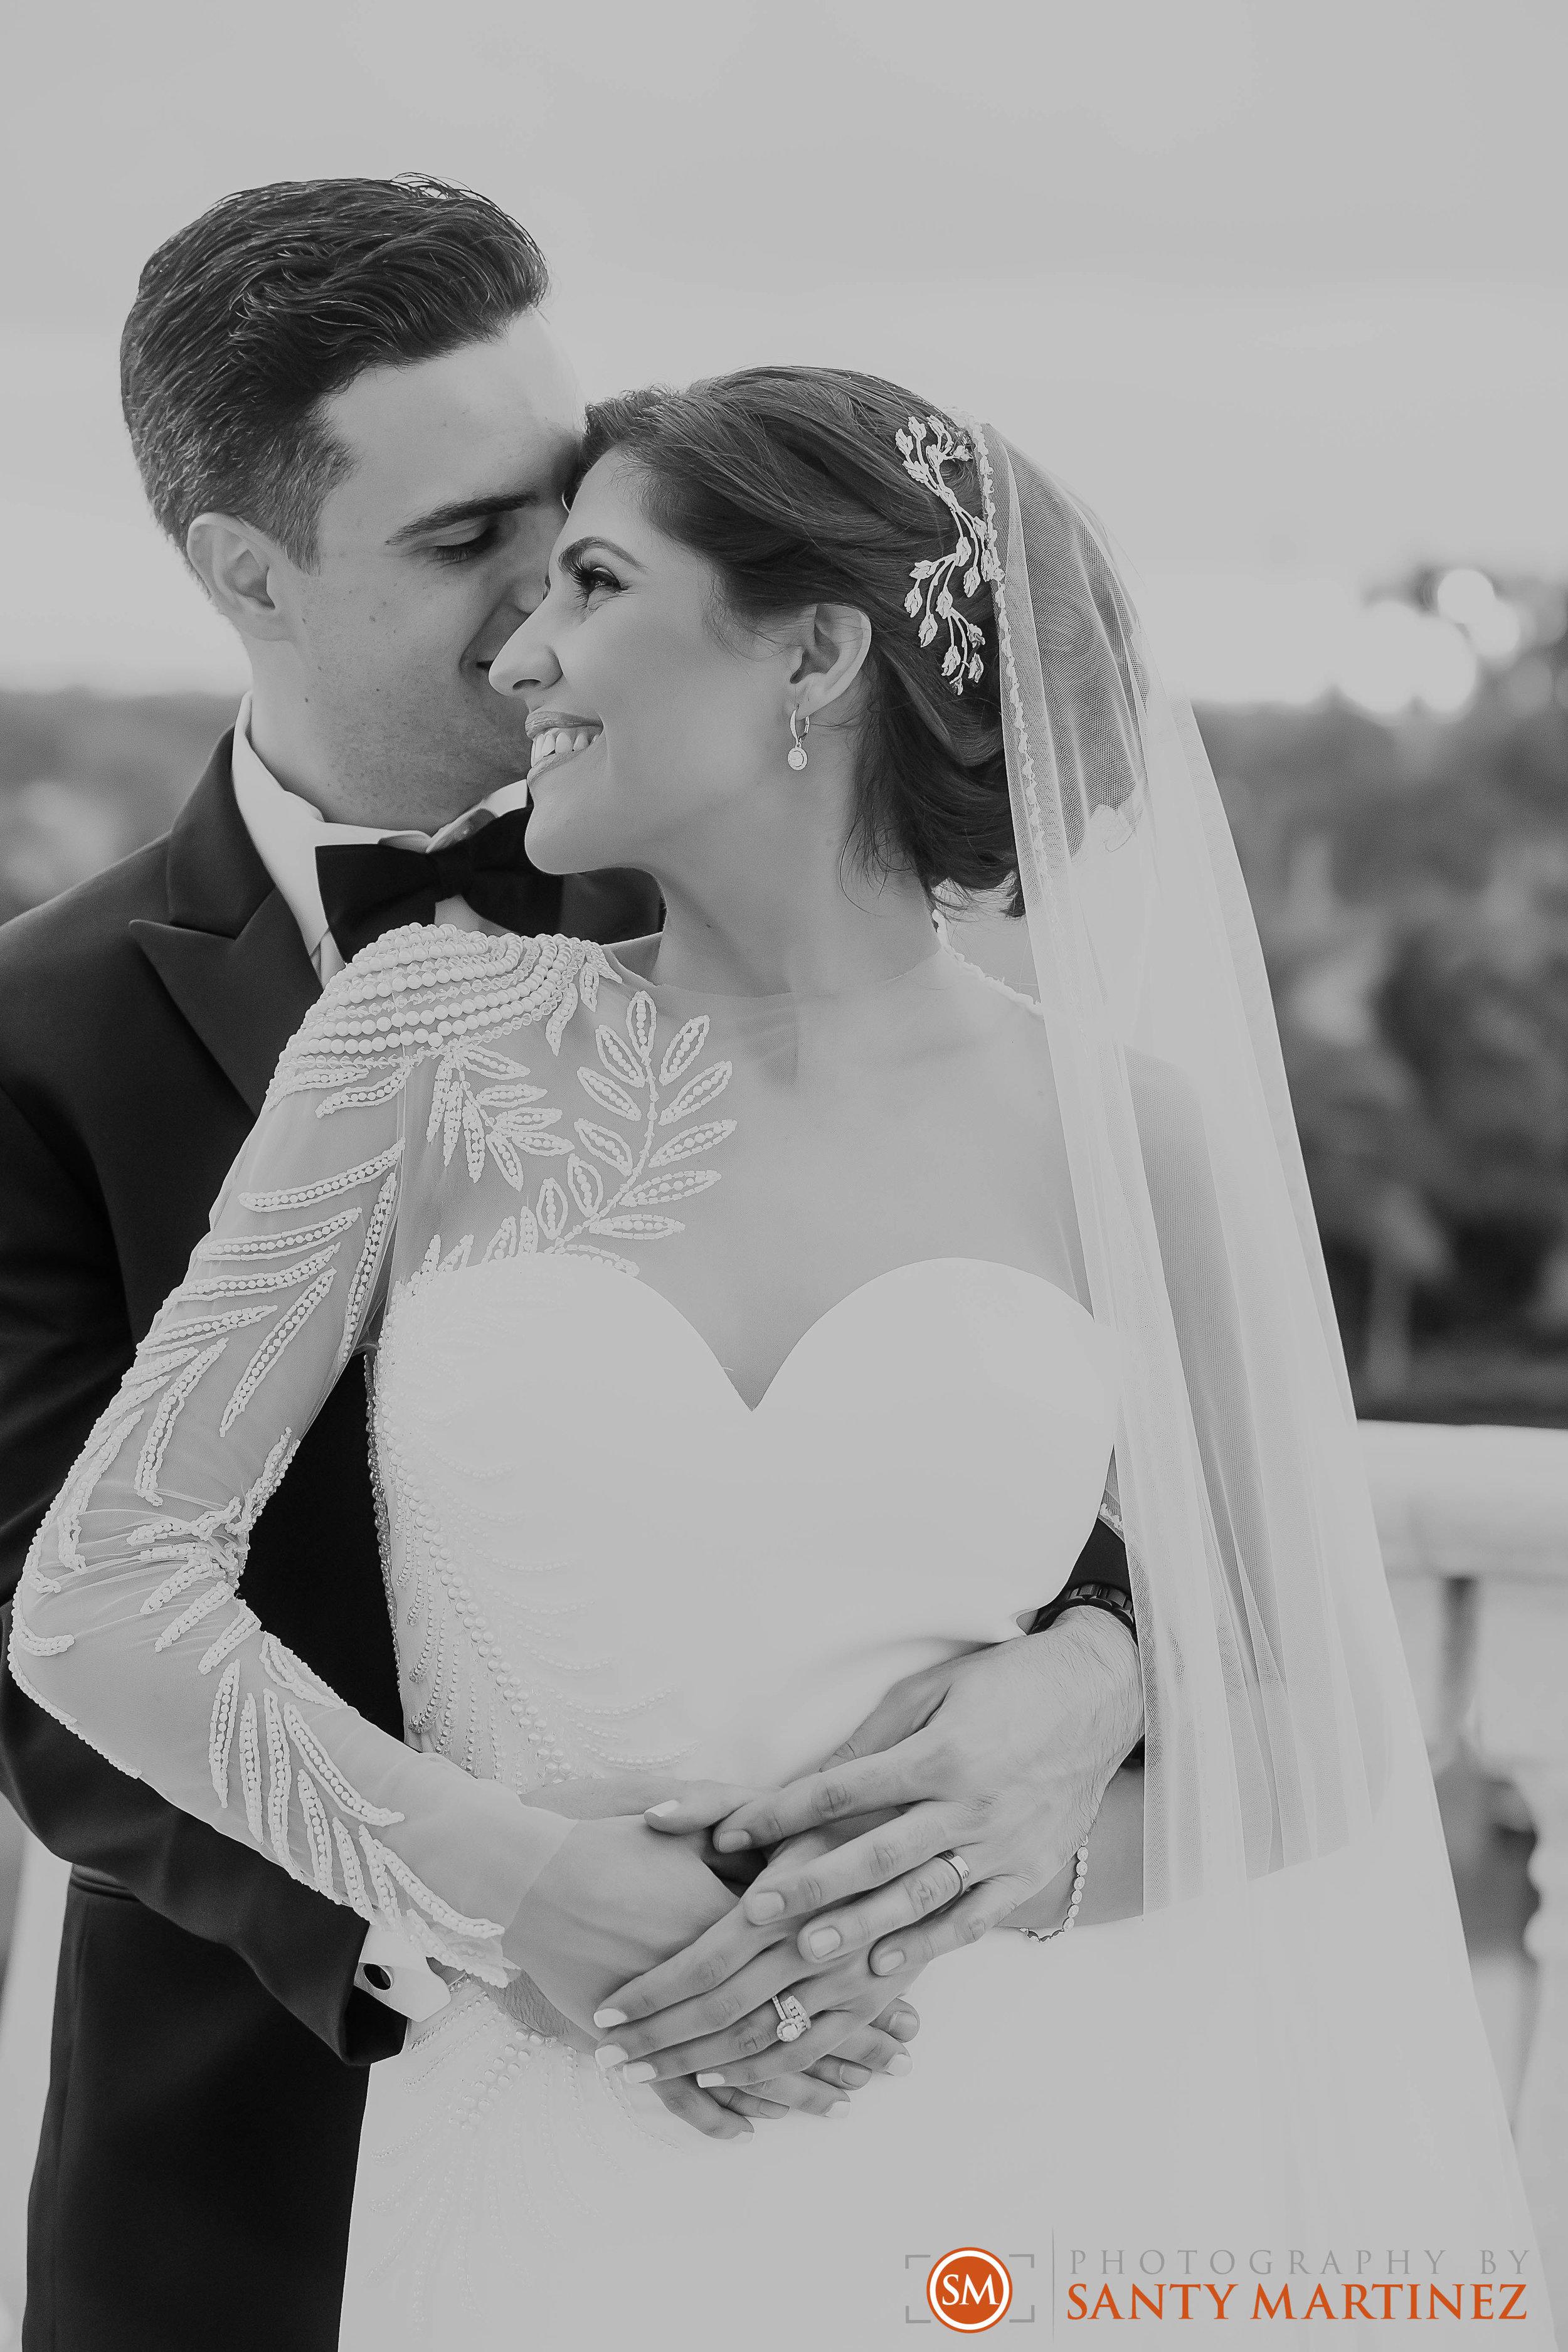 Wedding Trump National Doral Miami - Santy Martinez Photography-17.jpg